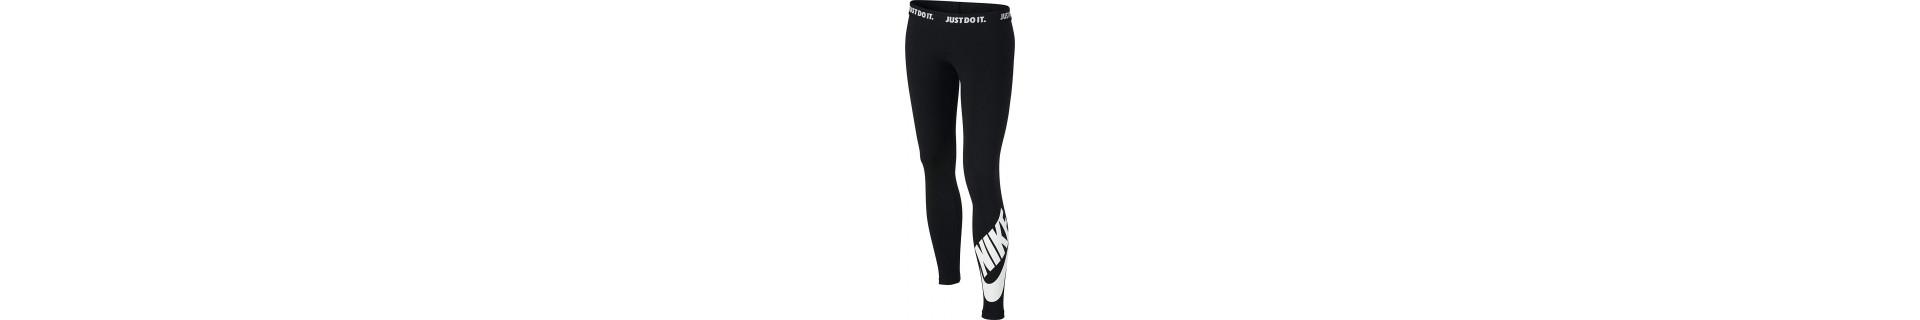 Mallas y leggins para mujer, Sontress, Adidas, Joma, Nike, Reebok, Puma